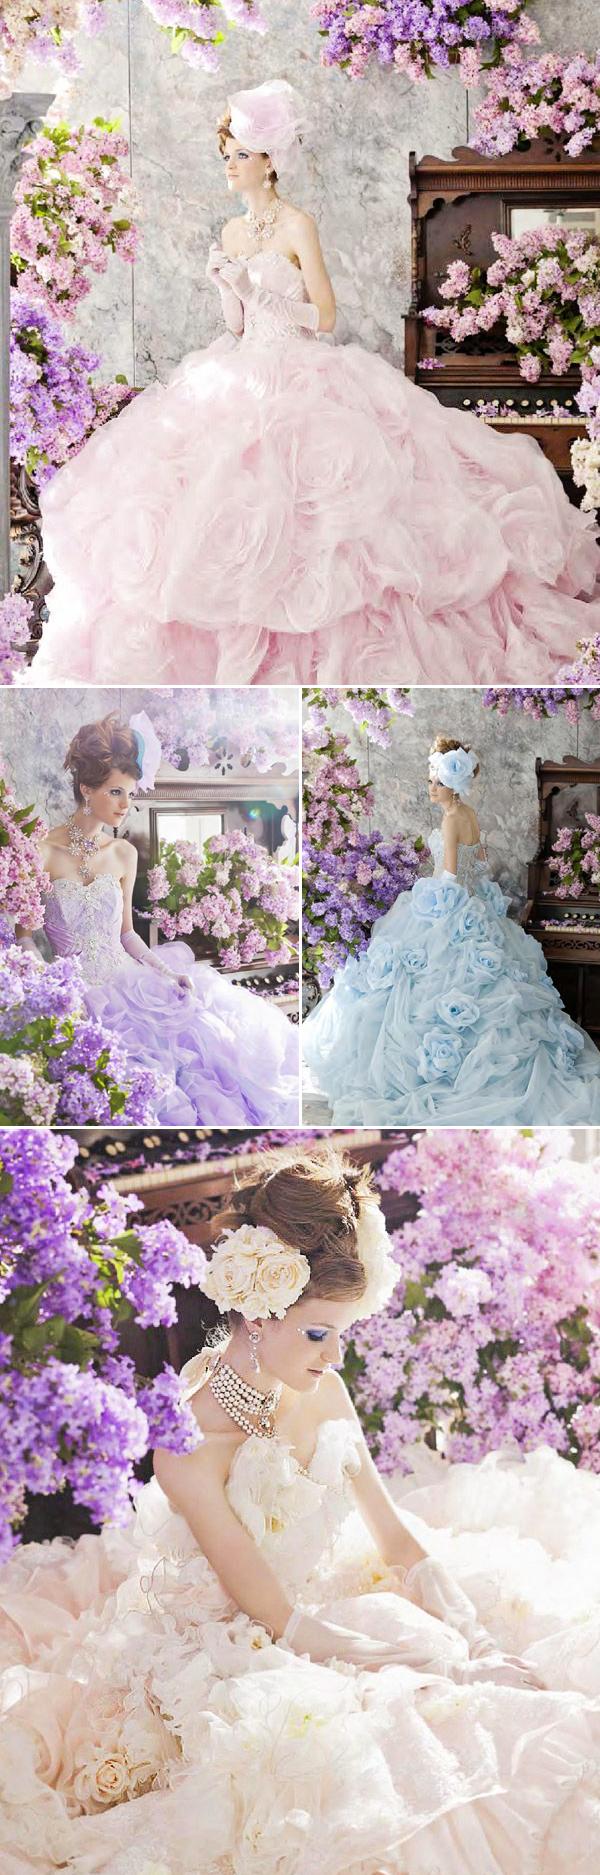 princess06-stella-de-libero